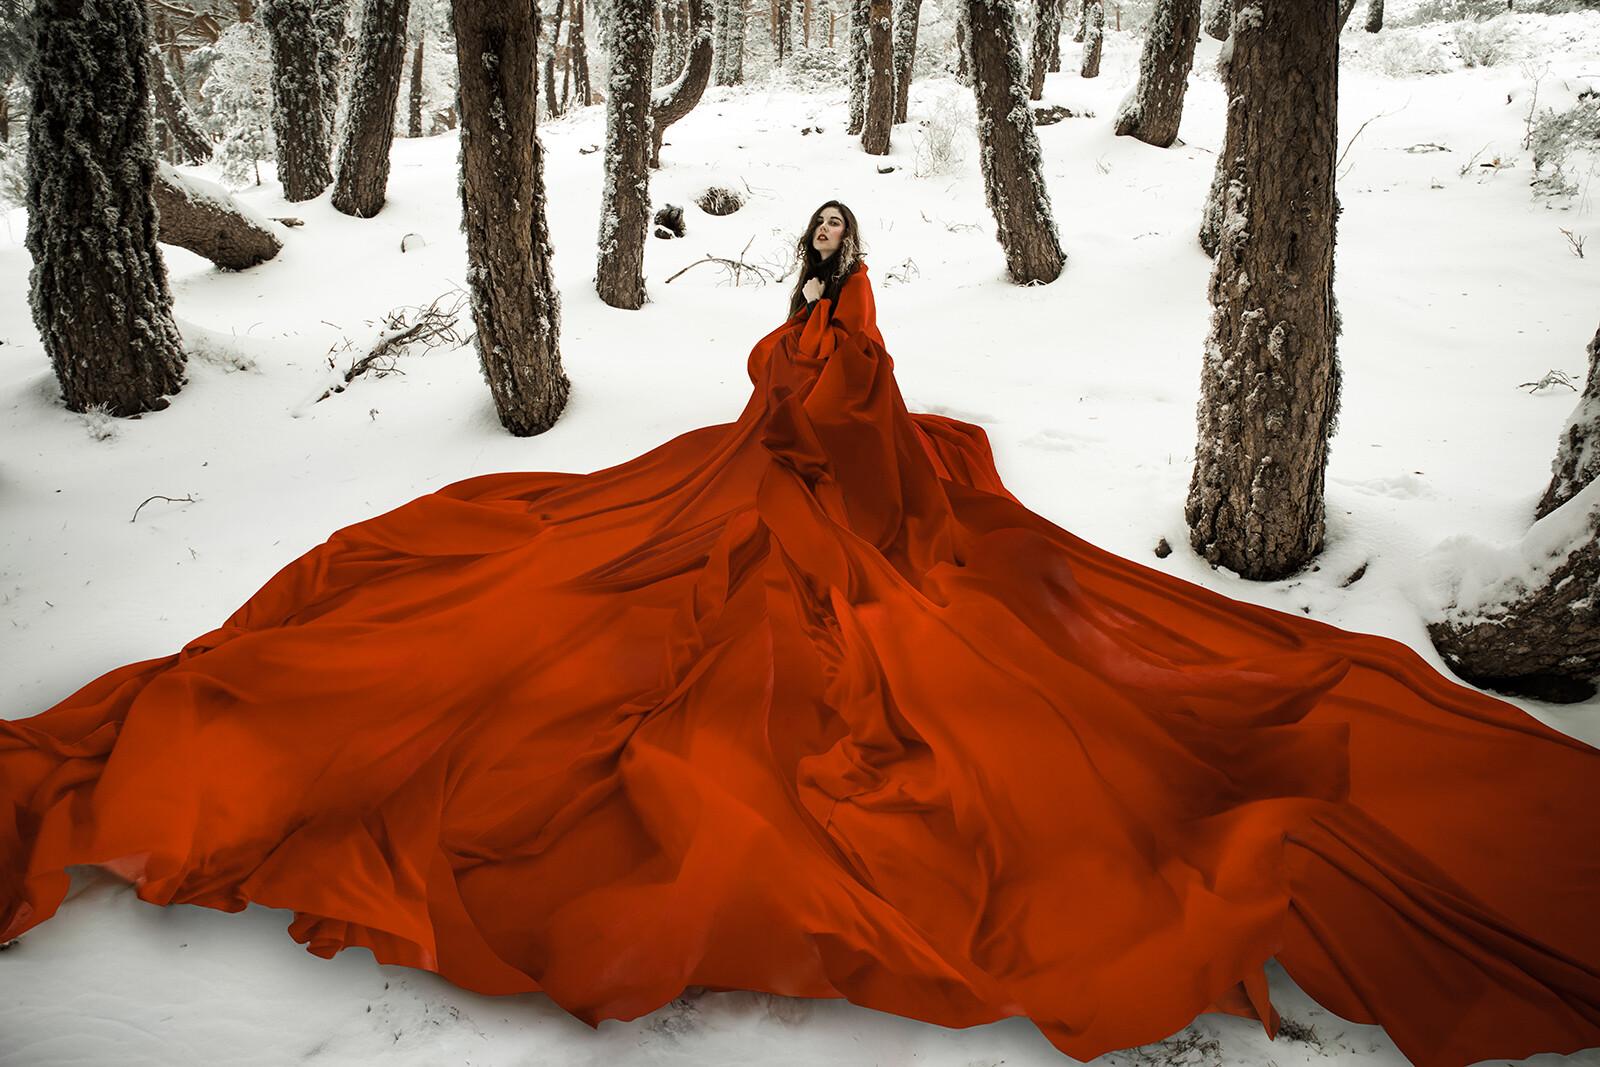 Blood Mineral - Leila Amat Ortega